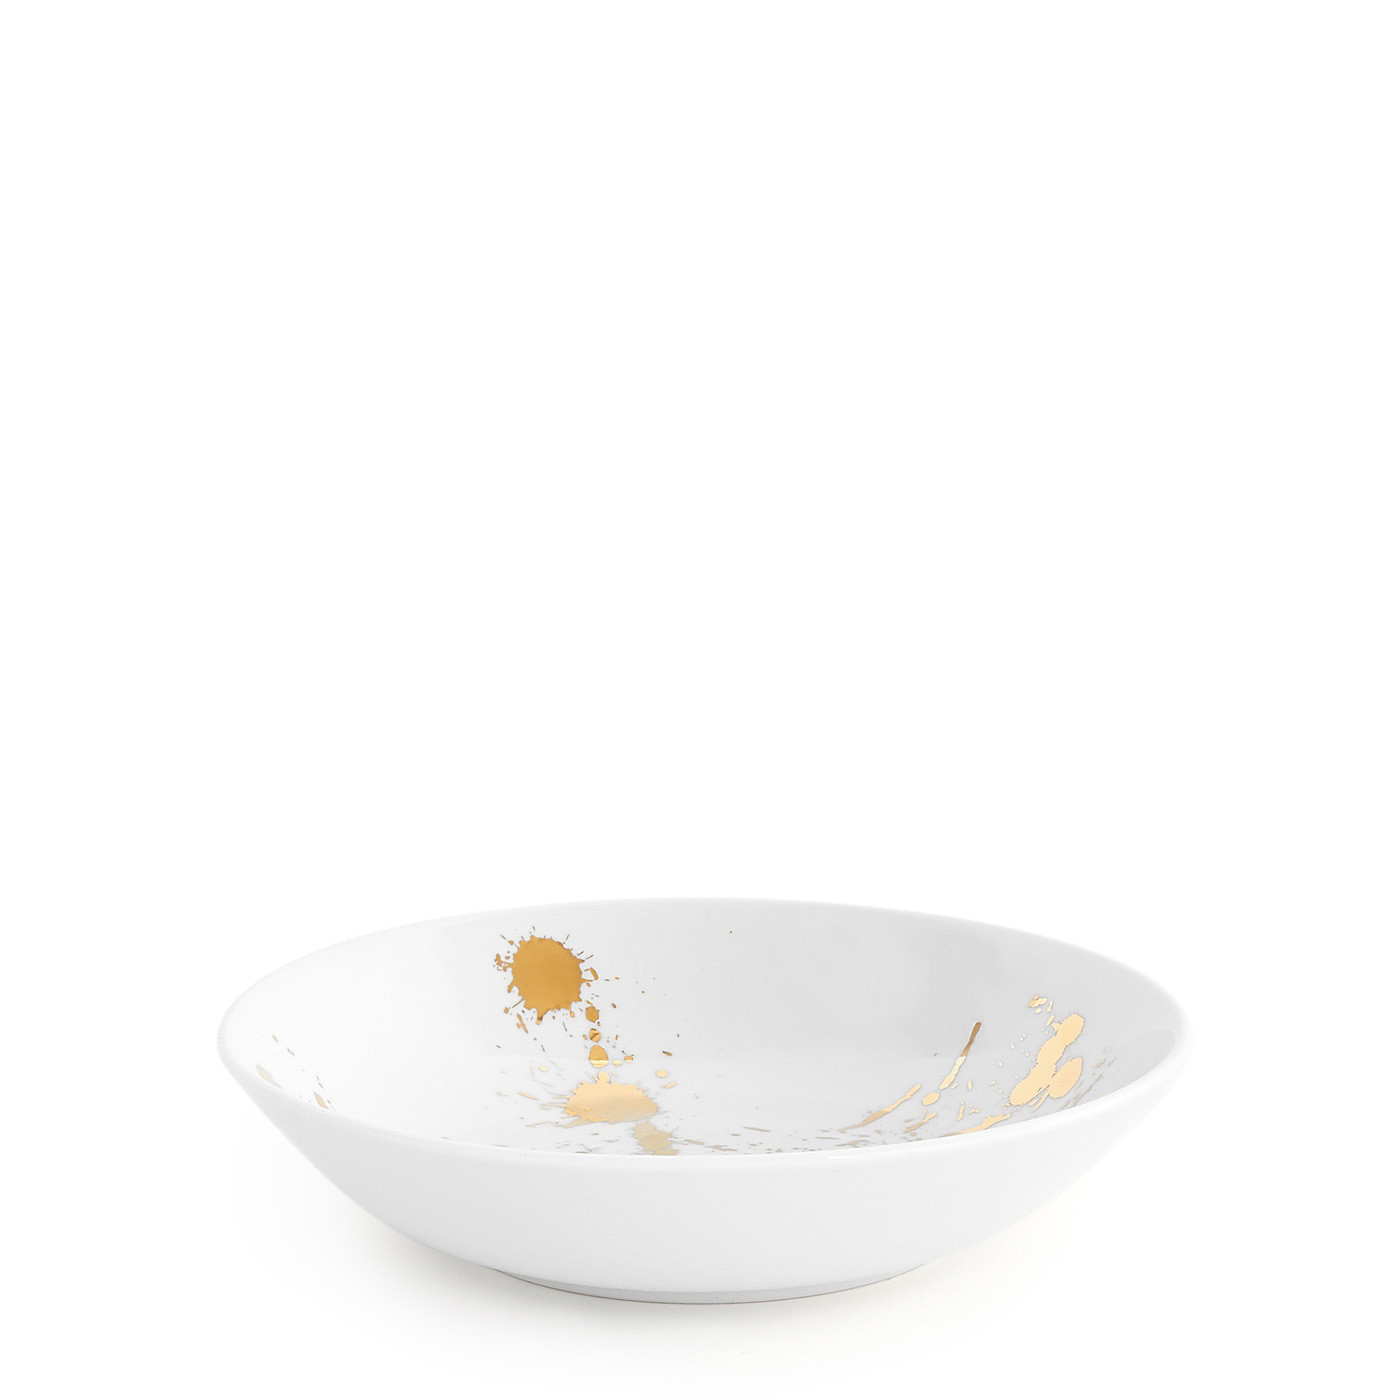 Jonathan Adler 1948 White and Gold Soup Bowl / Set of 8